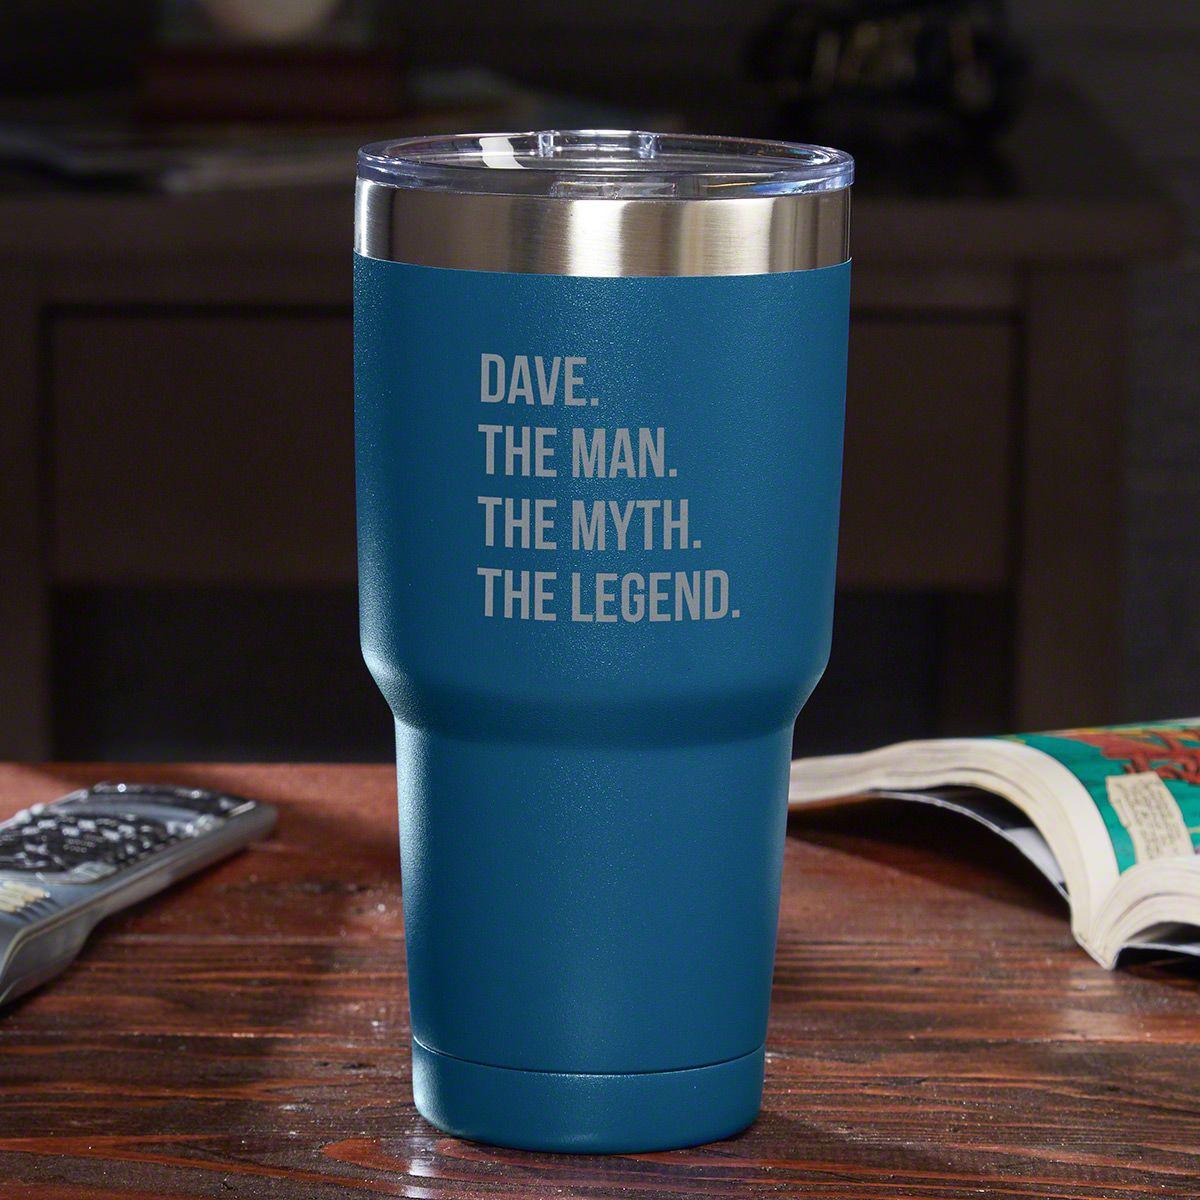 The Man The Myth The Legend Personalized Travel Mug - Blue